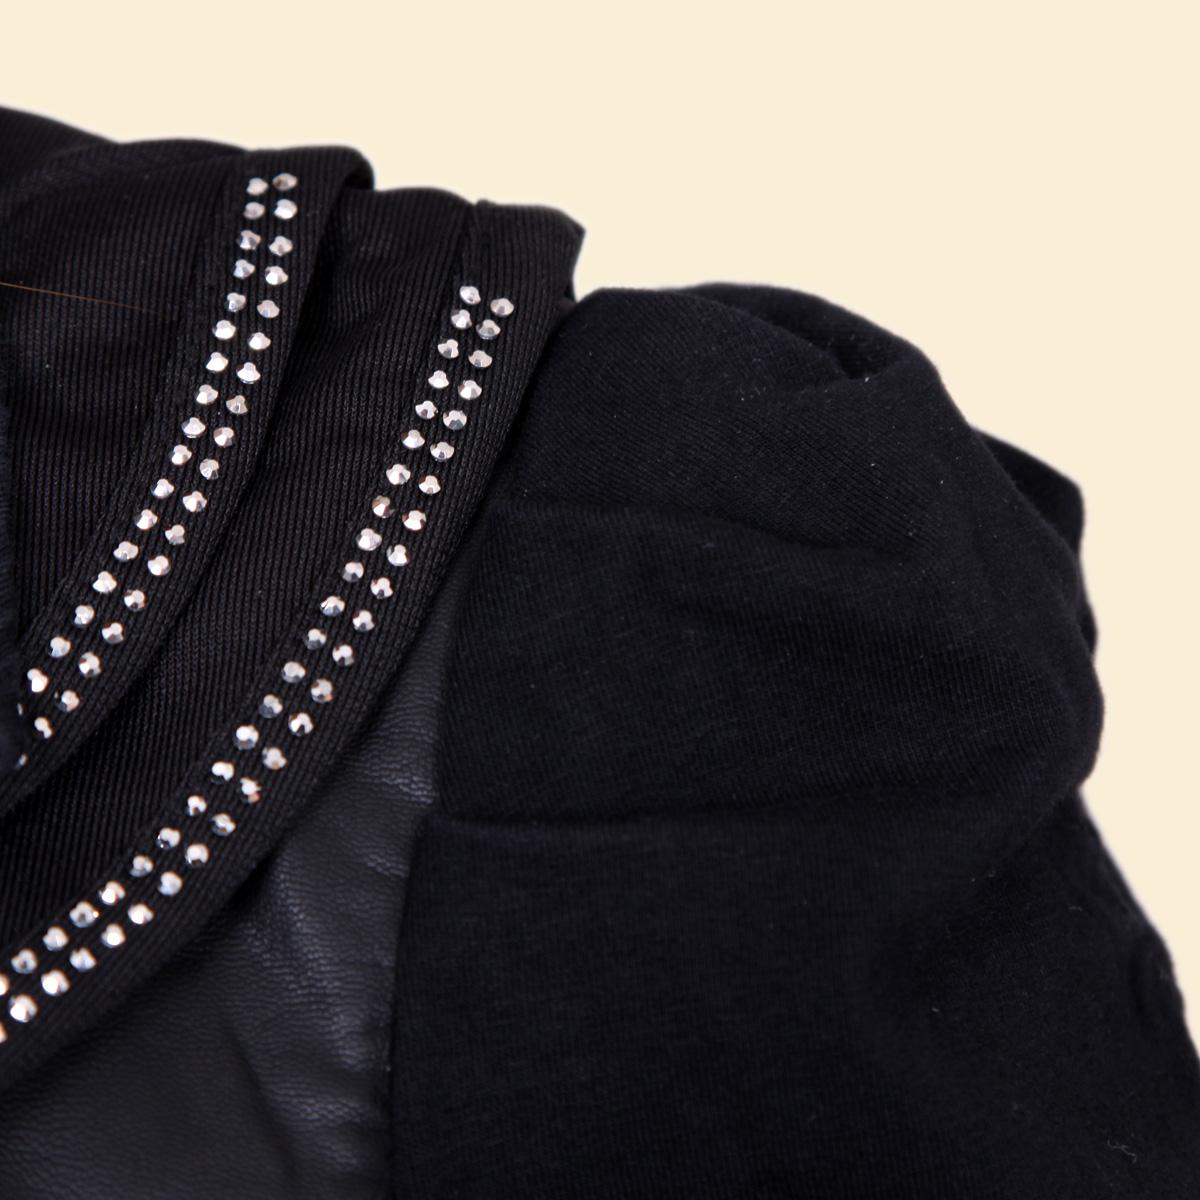 Женское платье 1061 2013 Pu Зима 2012 Трикотаж